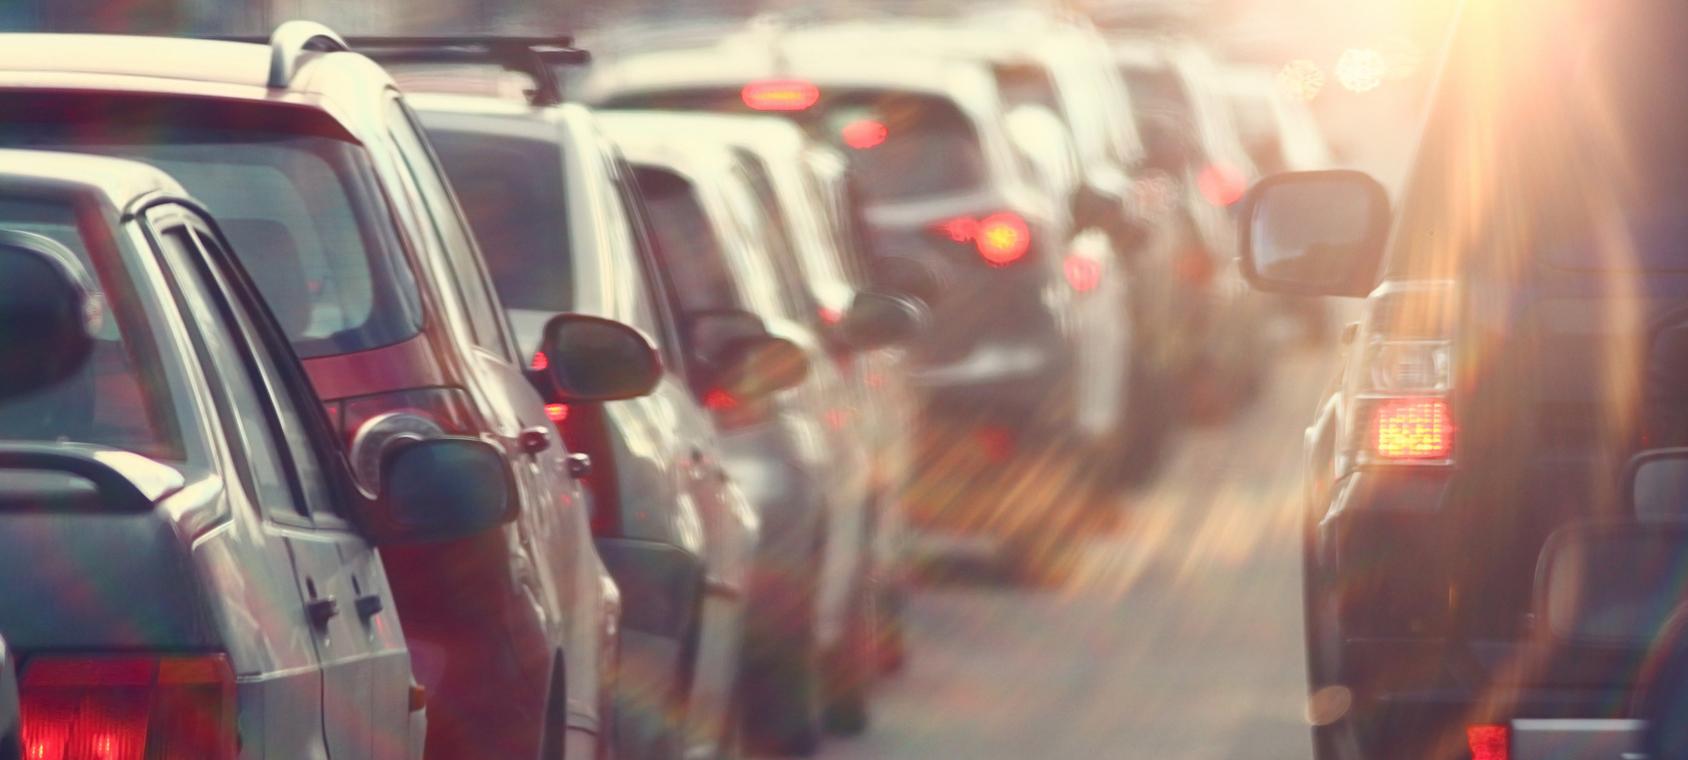 Boca-Raton-City-Traffic-FL68939938_M.jpg